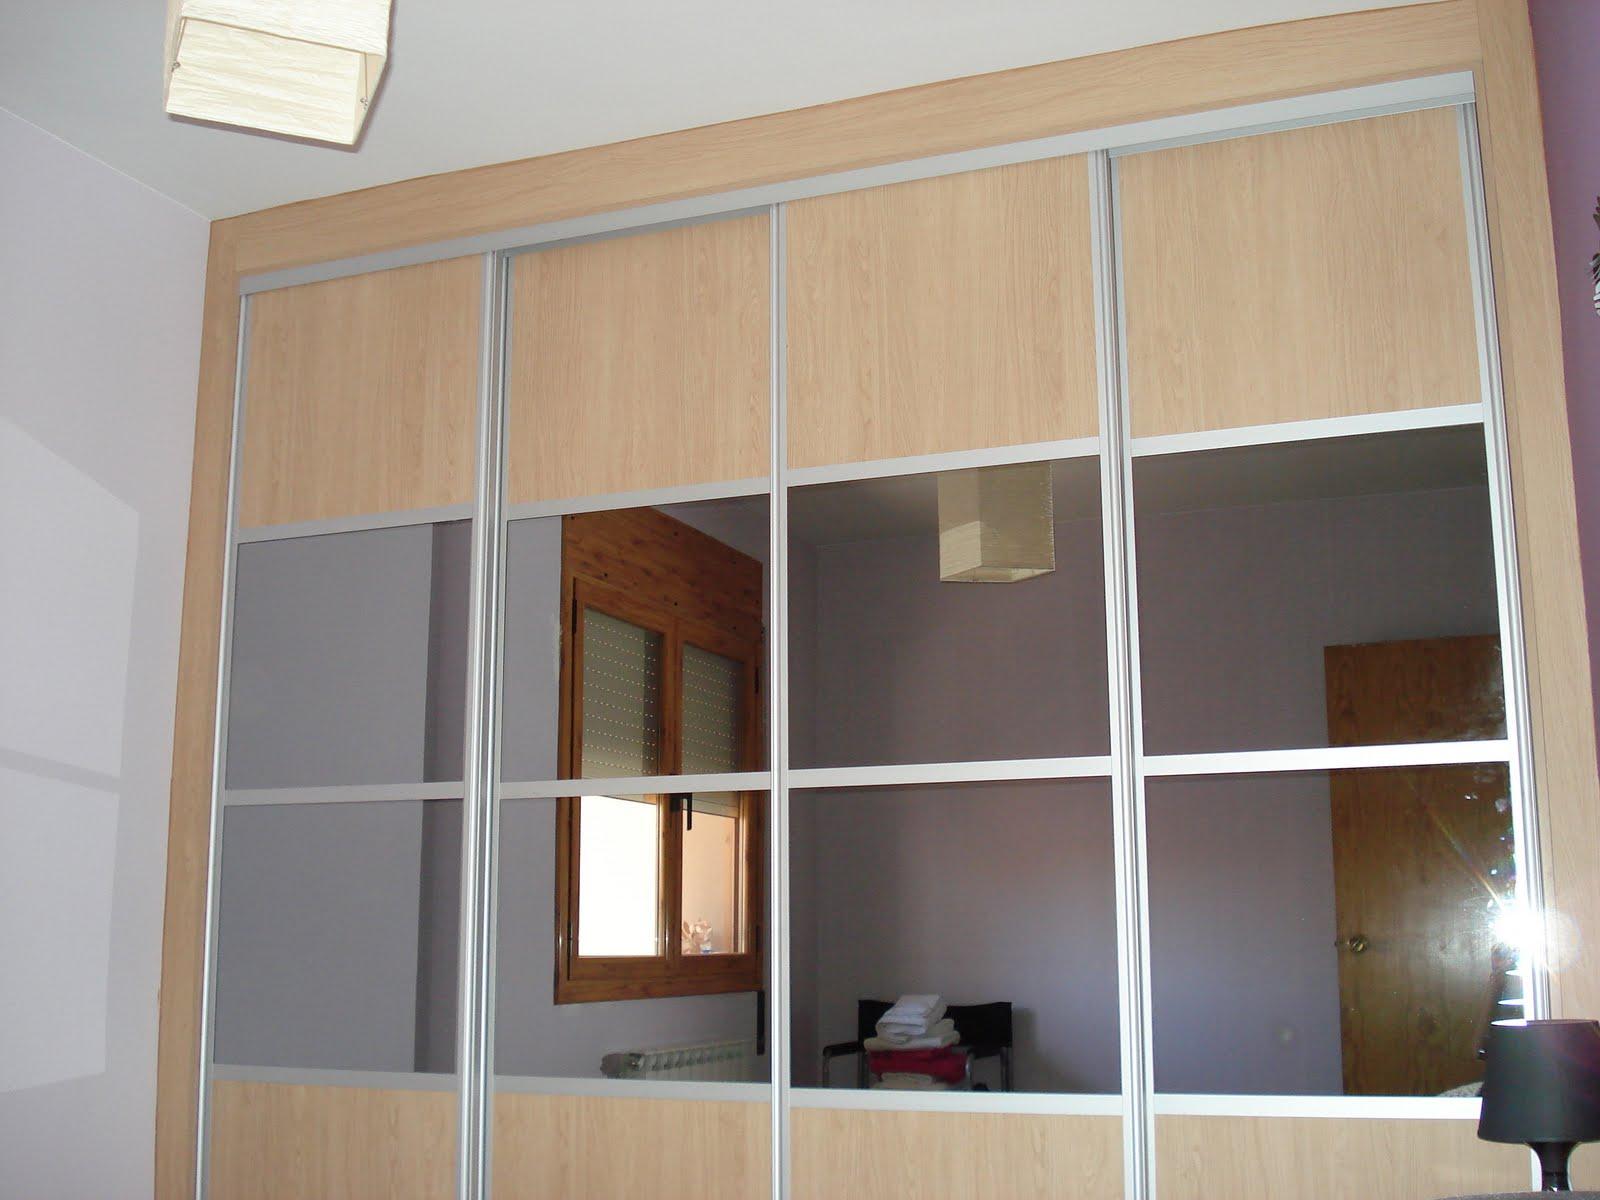 Renova for you armario empotrado con espejos - Perfiles de aluminio para armarios ...